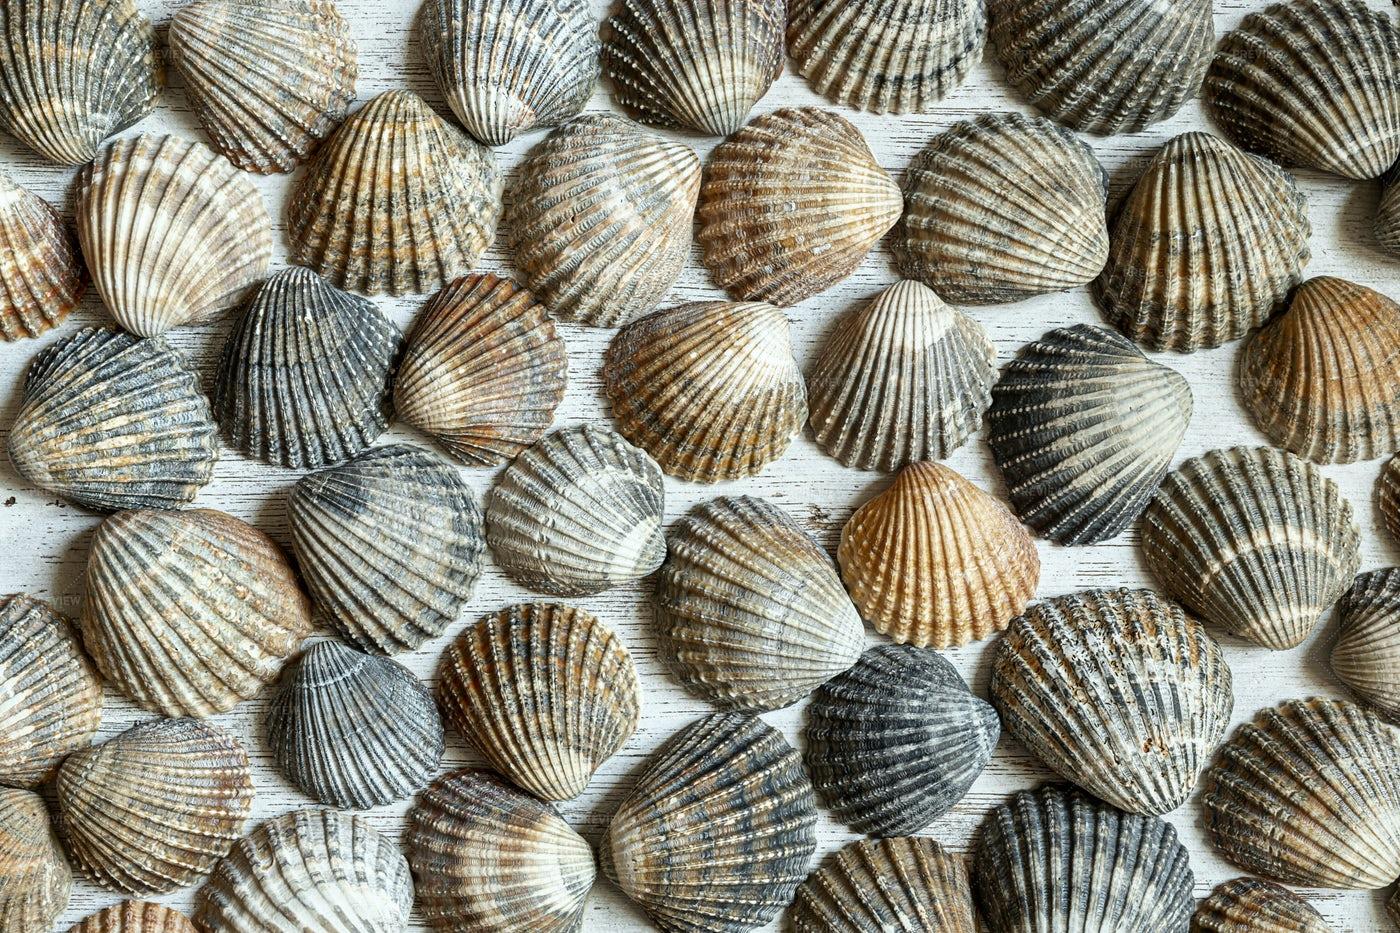 Seashells: Stock Photos